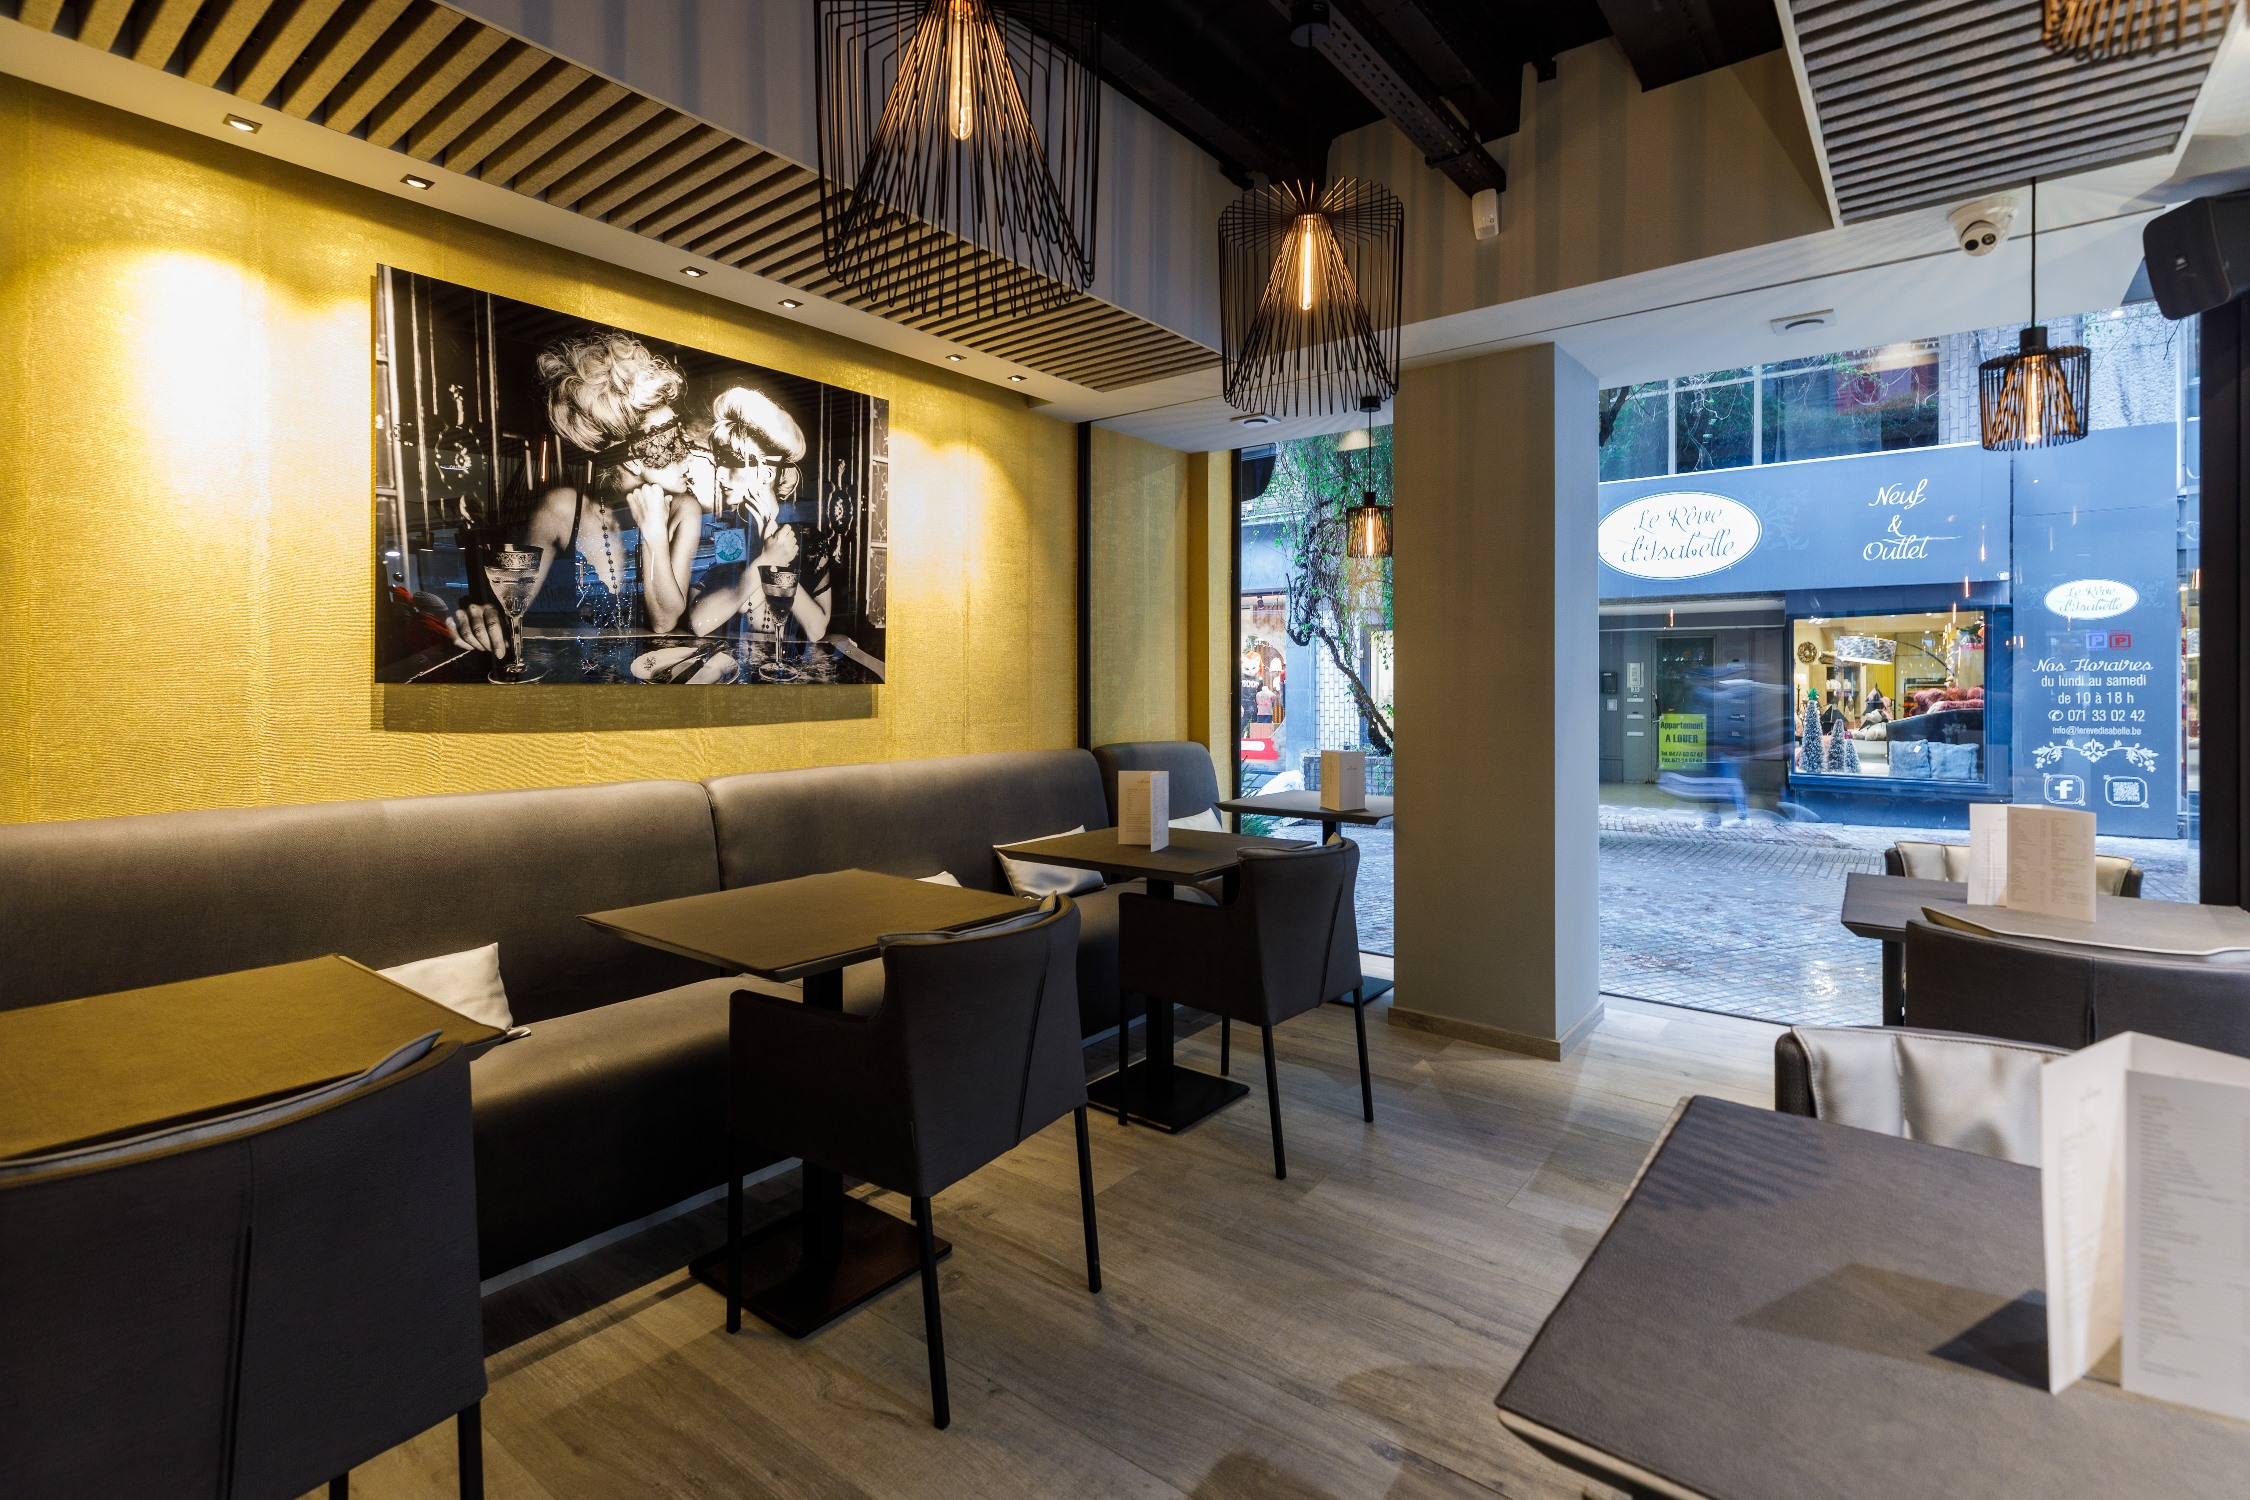 sixty-three-bar-food-restaurant-charleroi